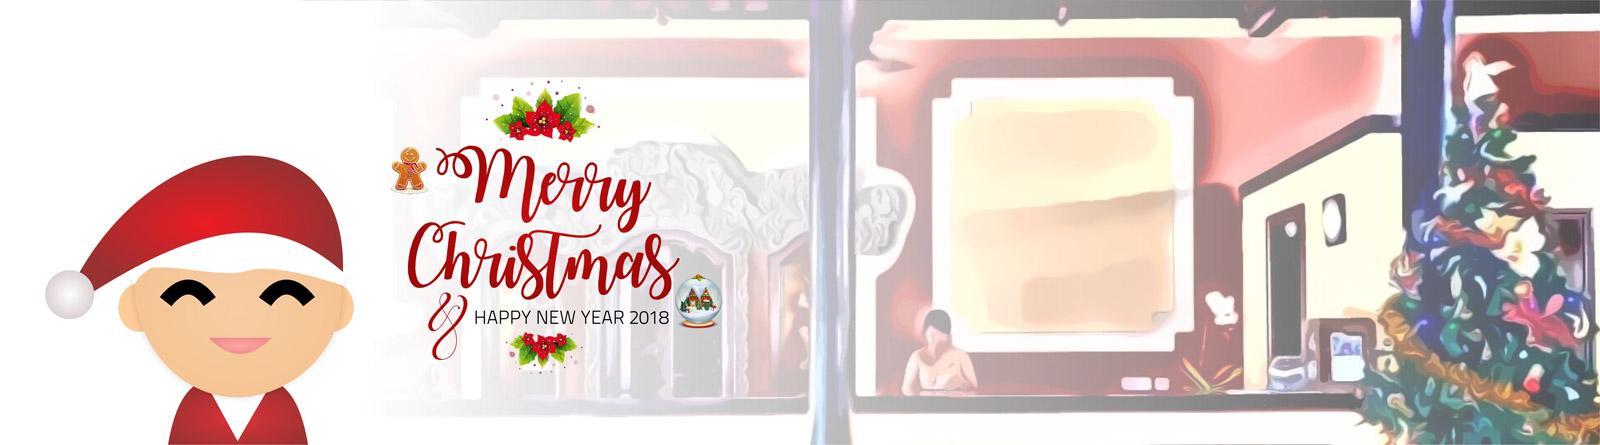 BGBR---Christmas-Greetings-Banner-